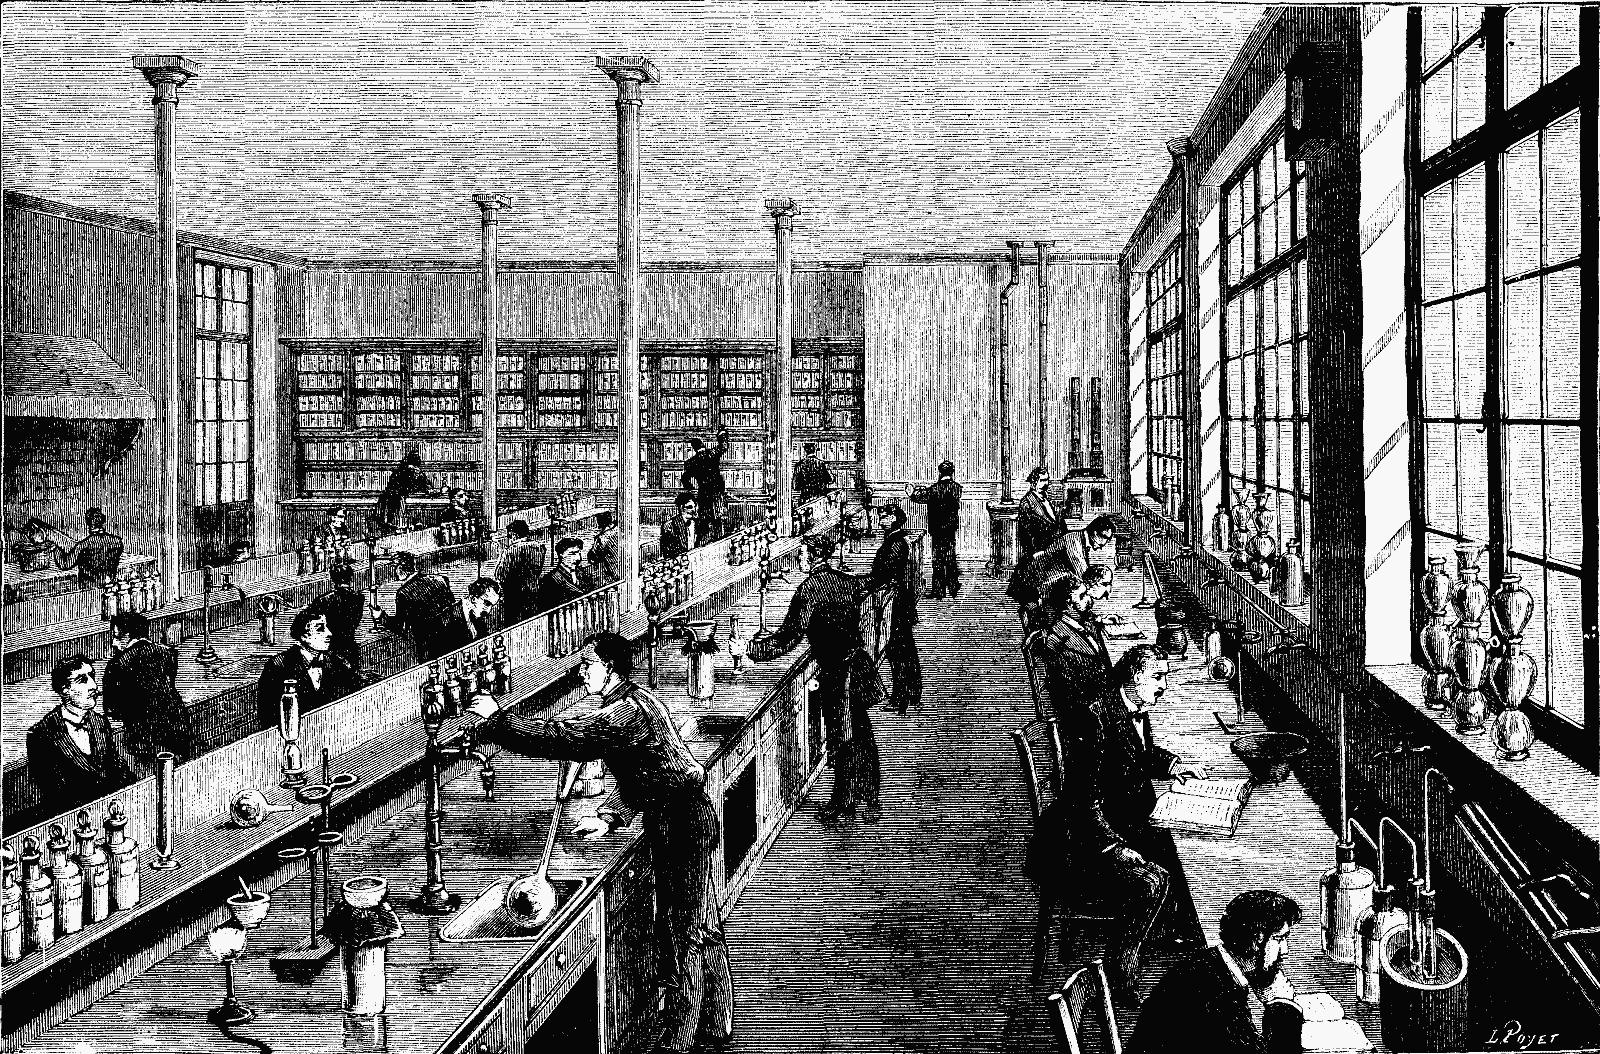 Description paris school of physics and chemistry laboratory 1884